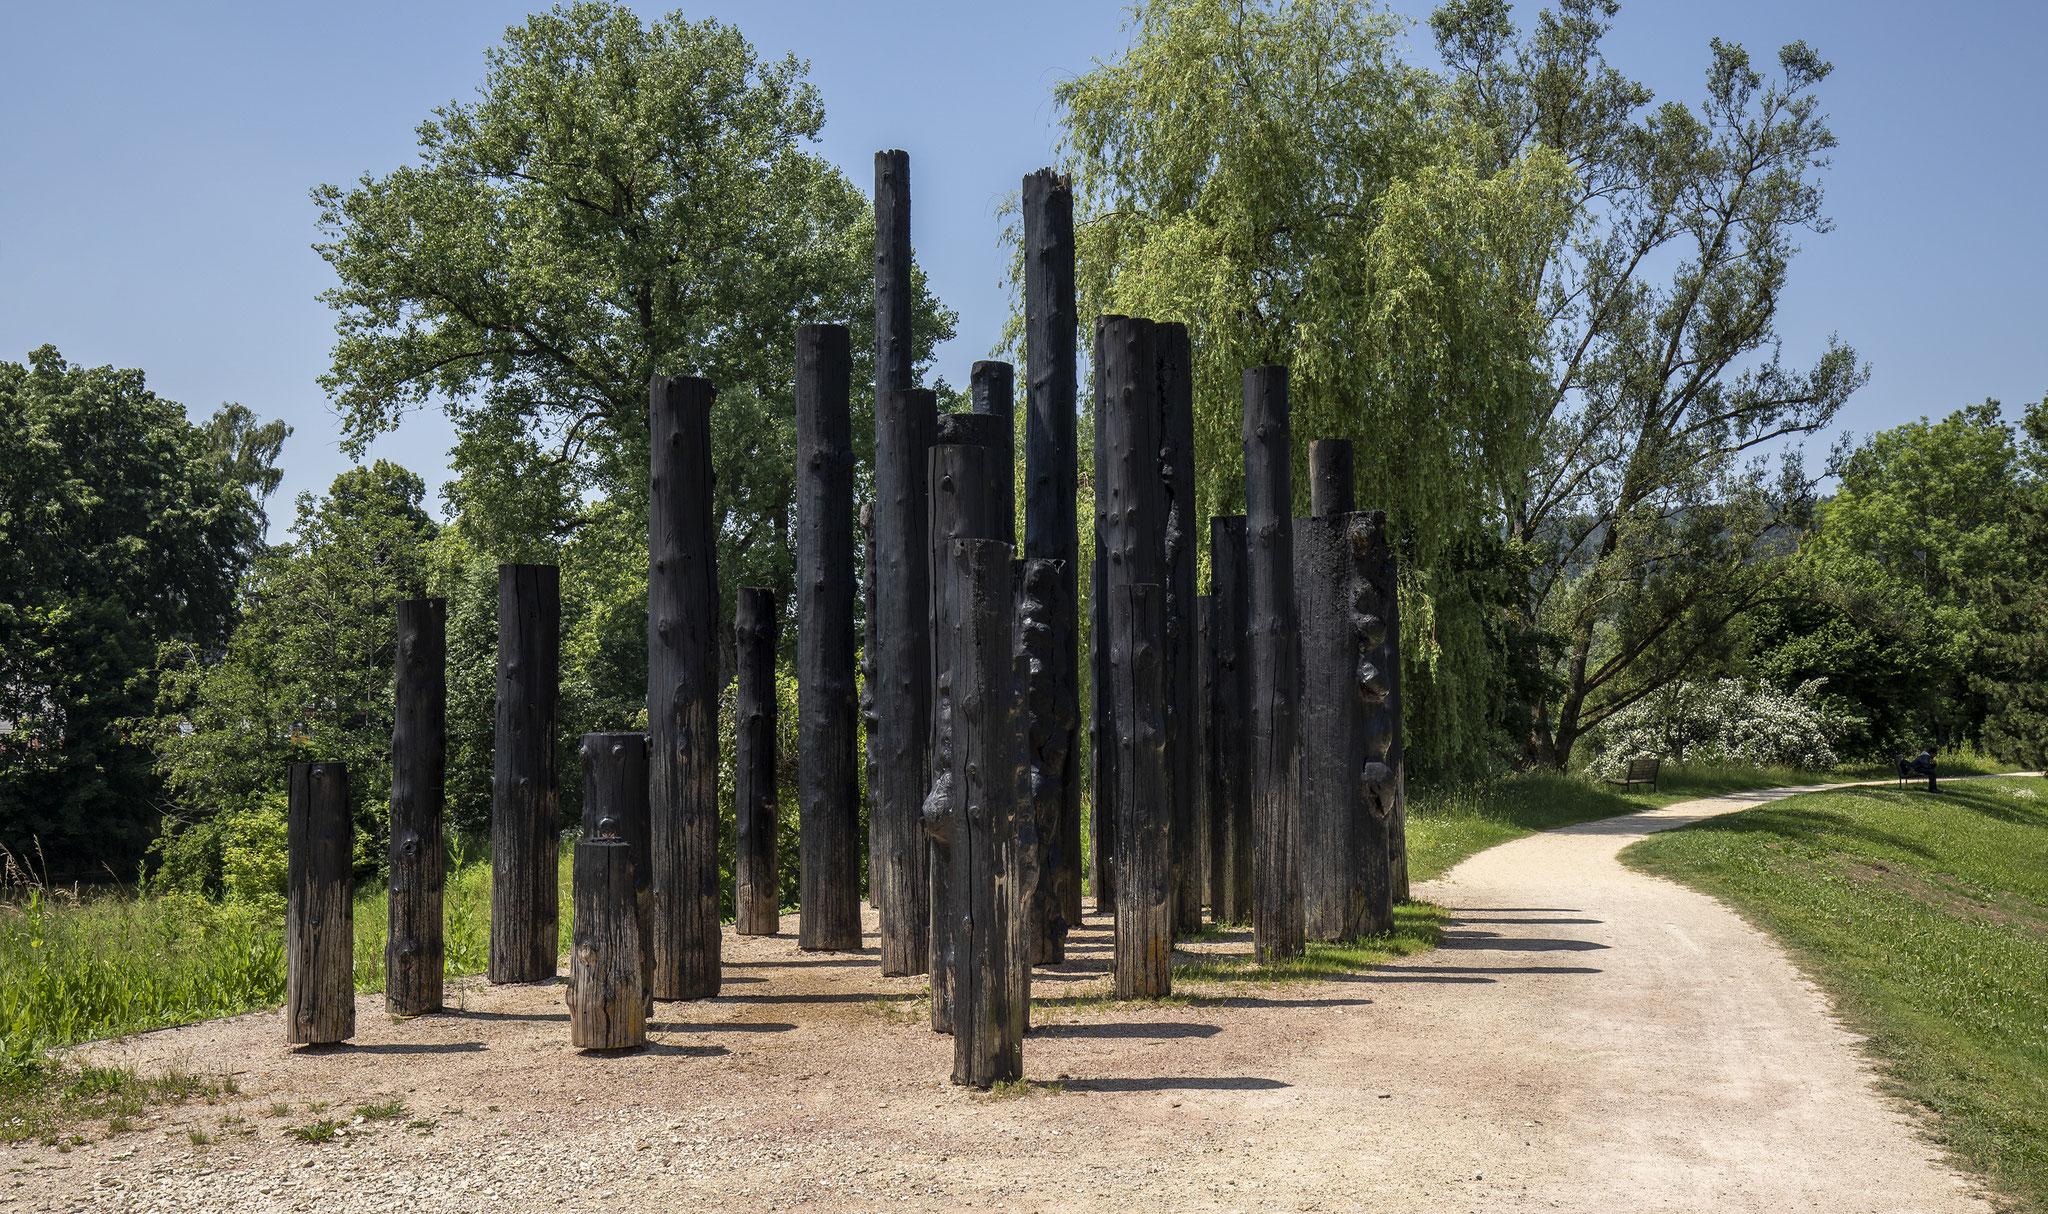 JOHANNES PFEIFFER Metamorphose, 2003 - 2019 Holzstämme, Bitumen